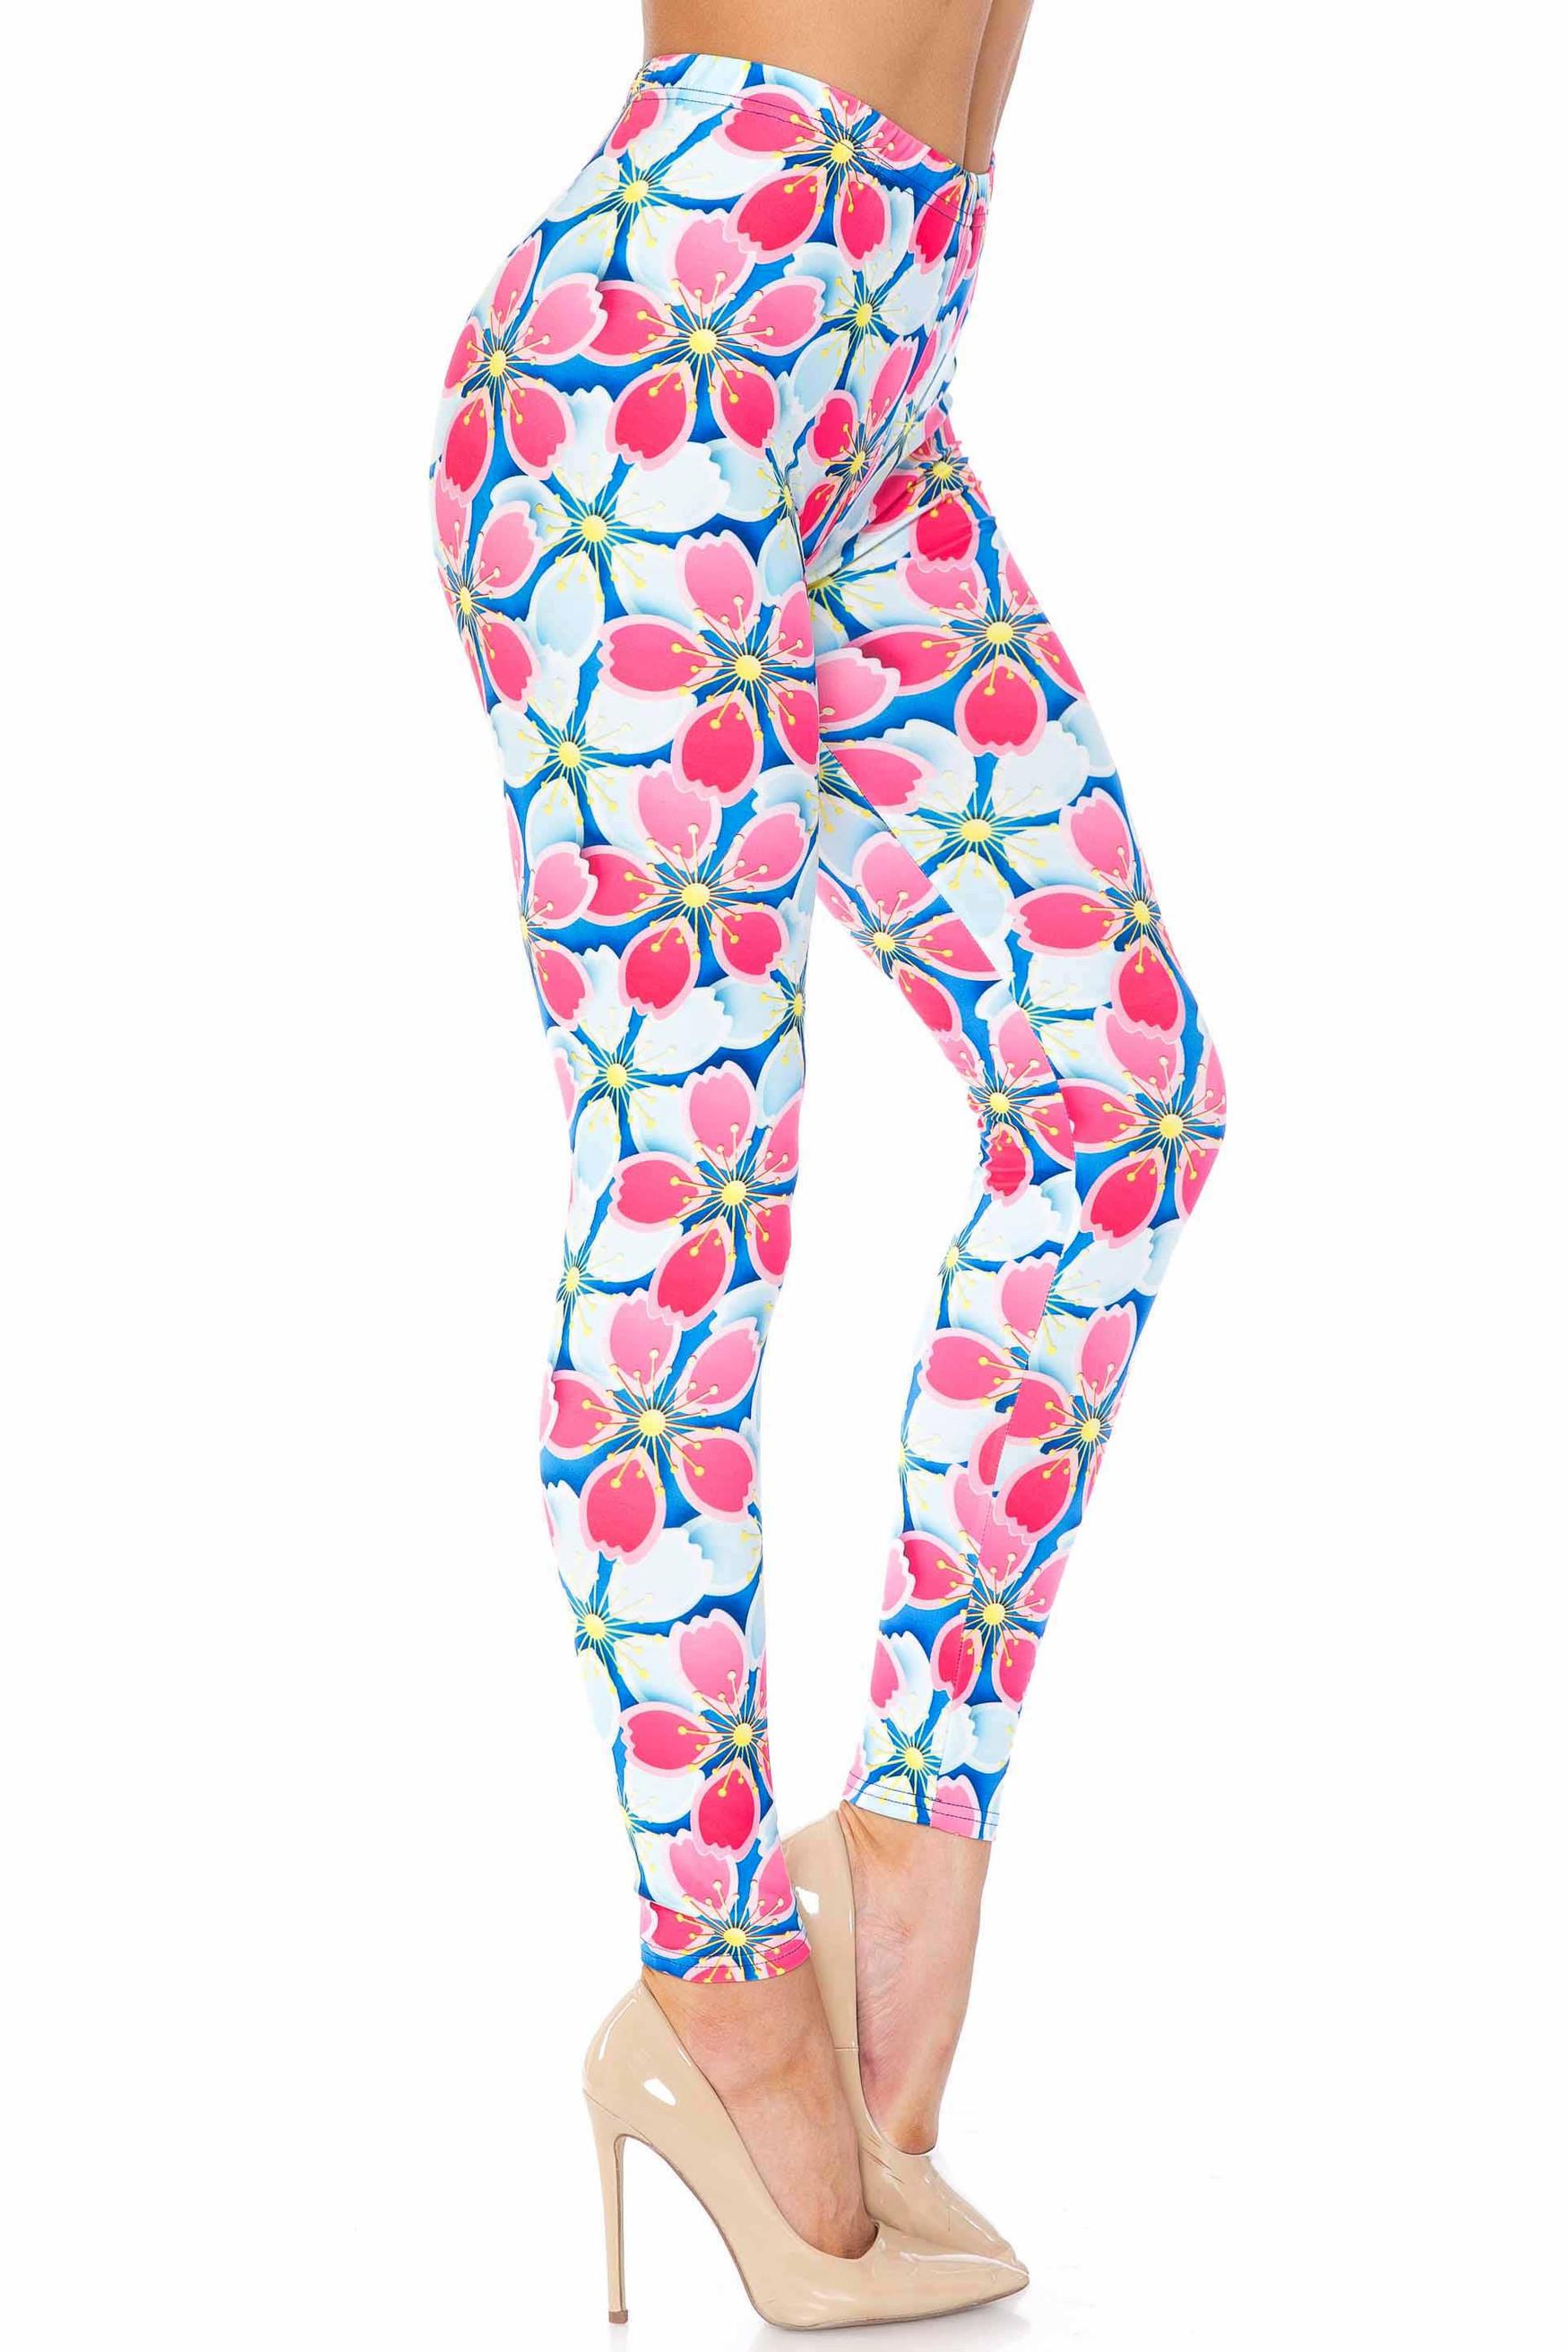 Creamy Soft Pink and Blue Sunshine Floral Plus Size Leggings - USA Fashion™